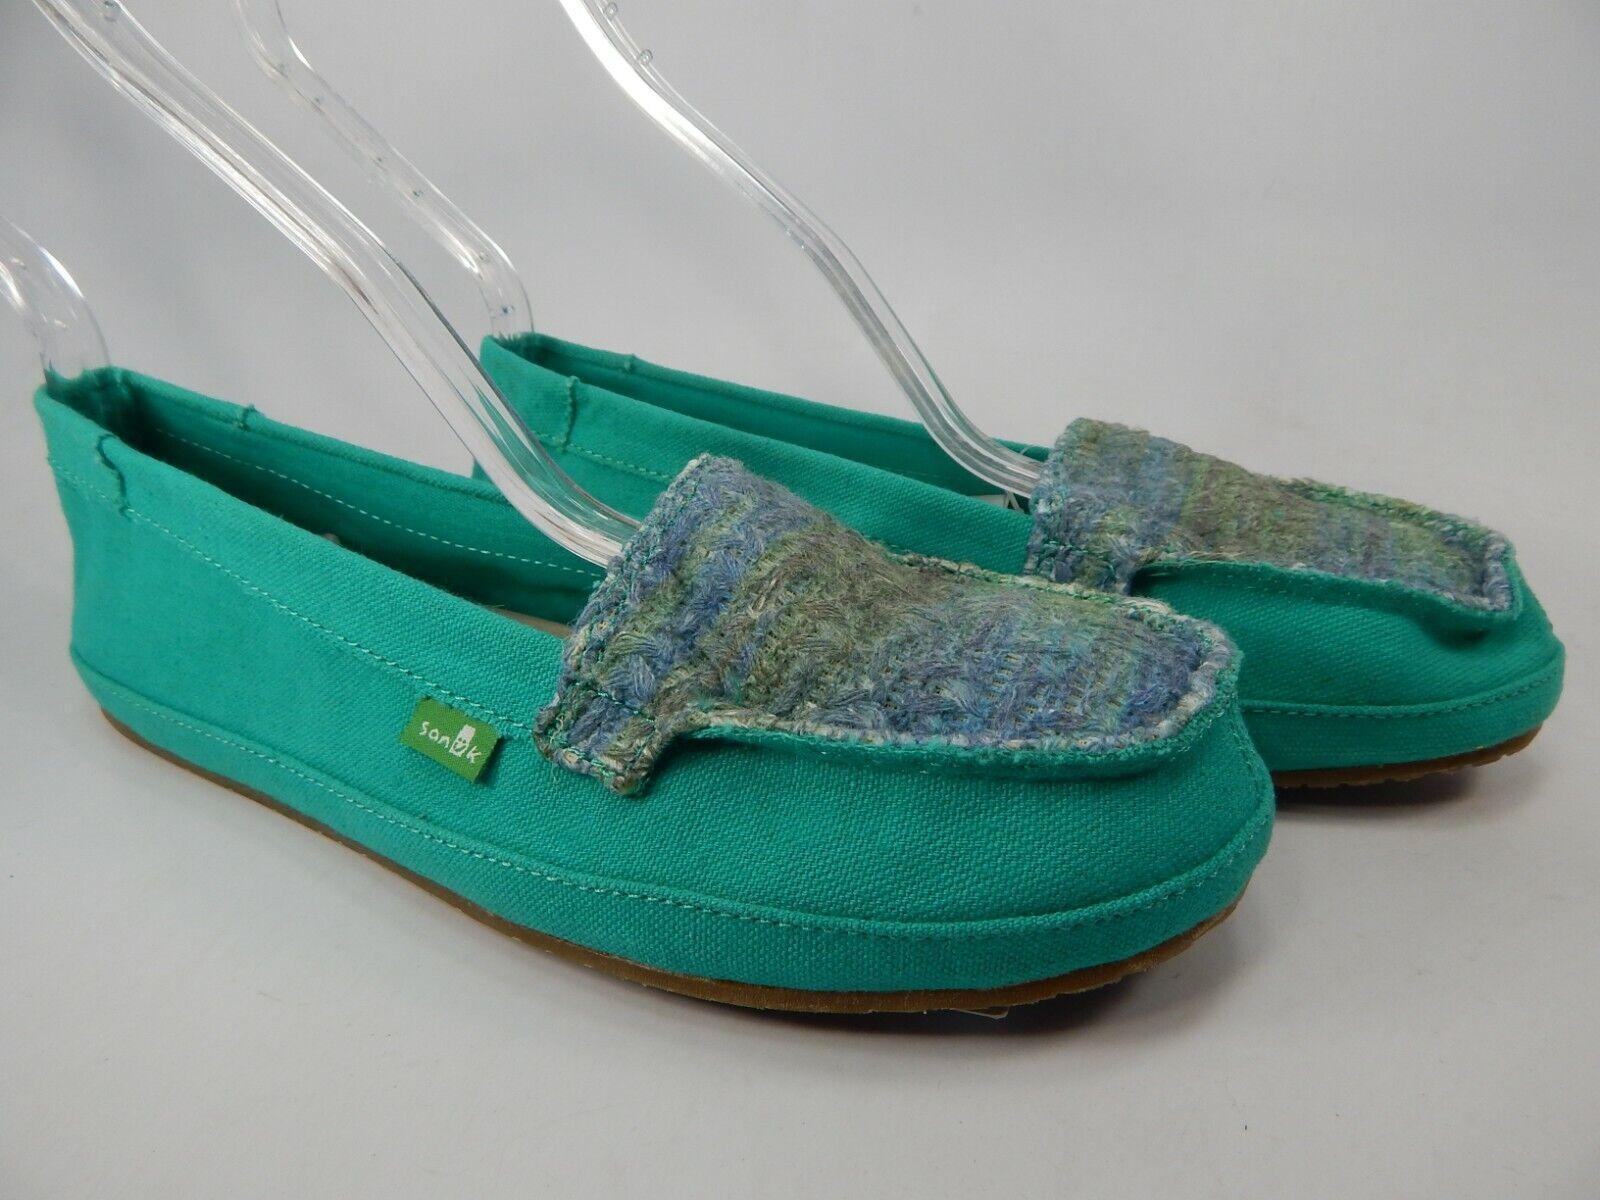 Sanuk Zu Zu Udpate Sidewalk Surfers Size 7 M (B) EU 38 Women's Slip On shoes